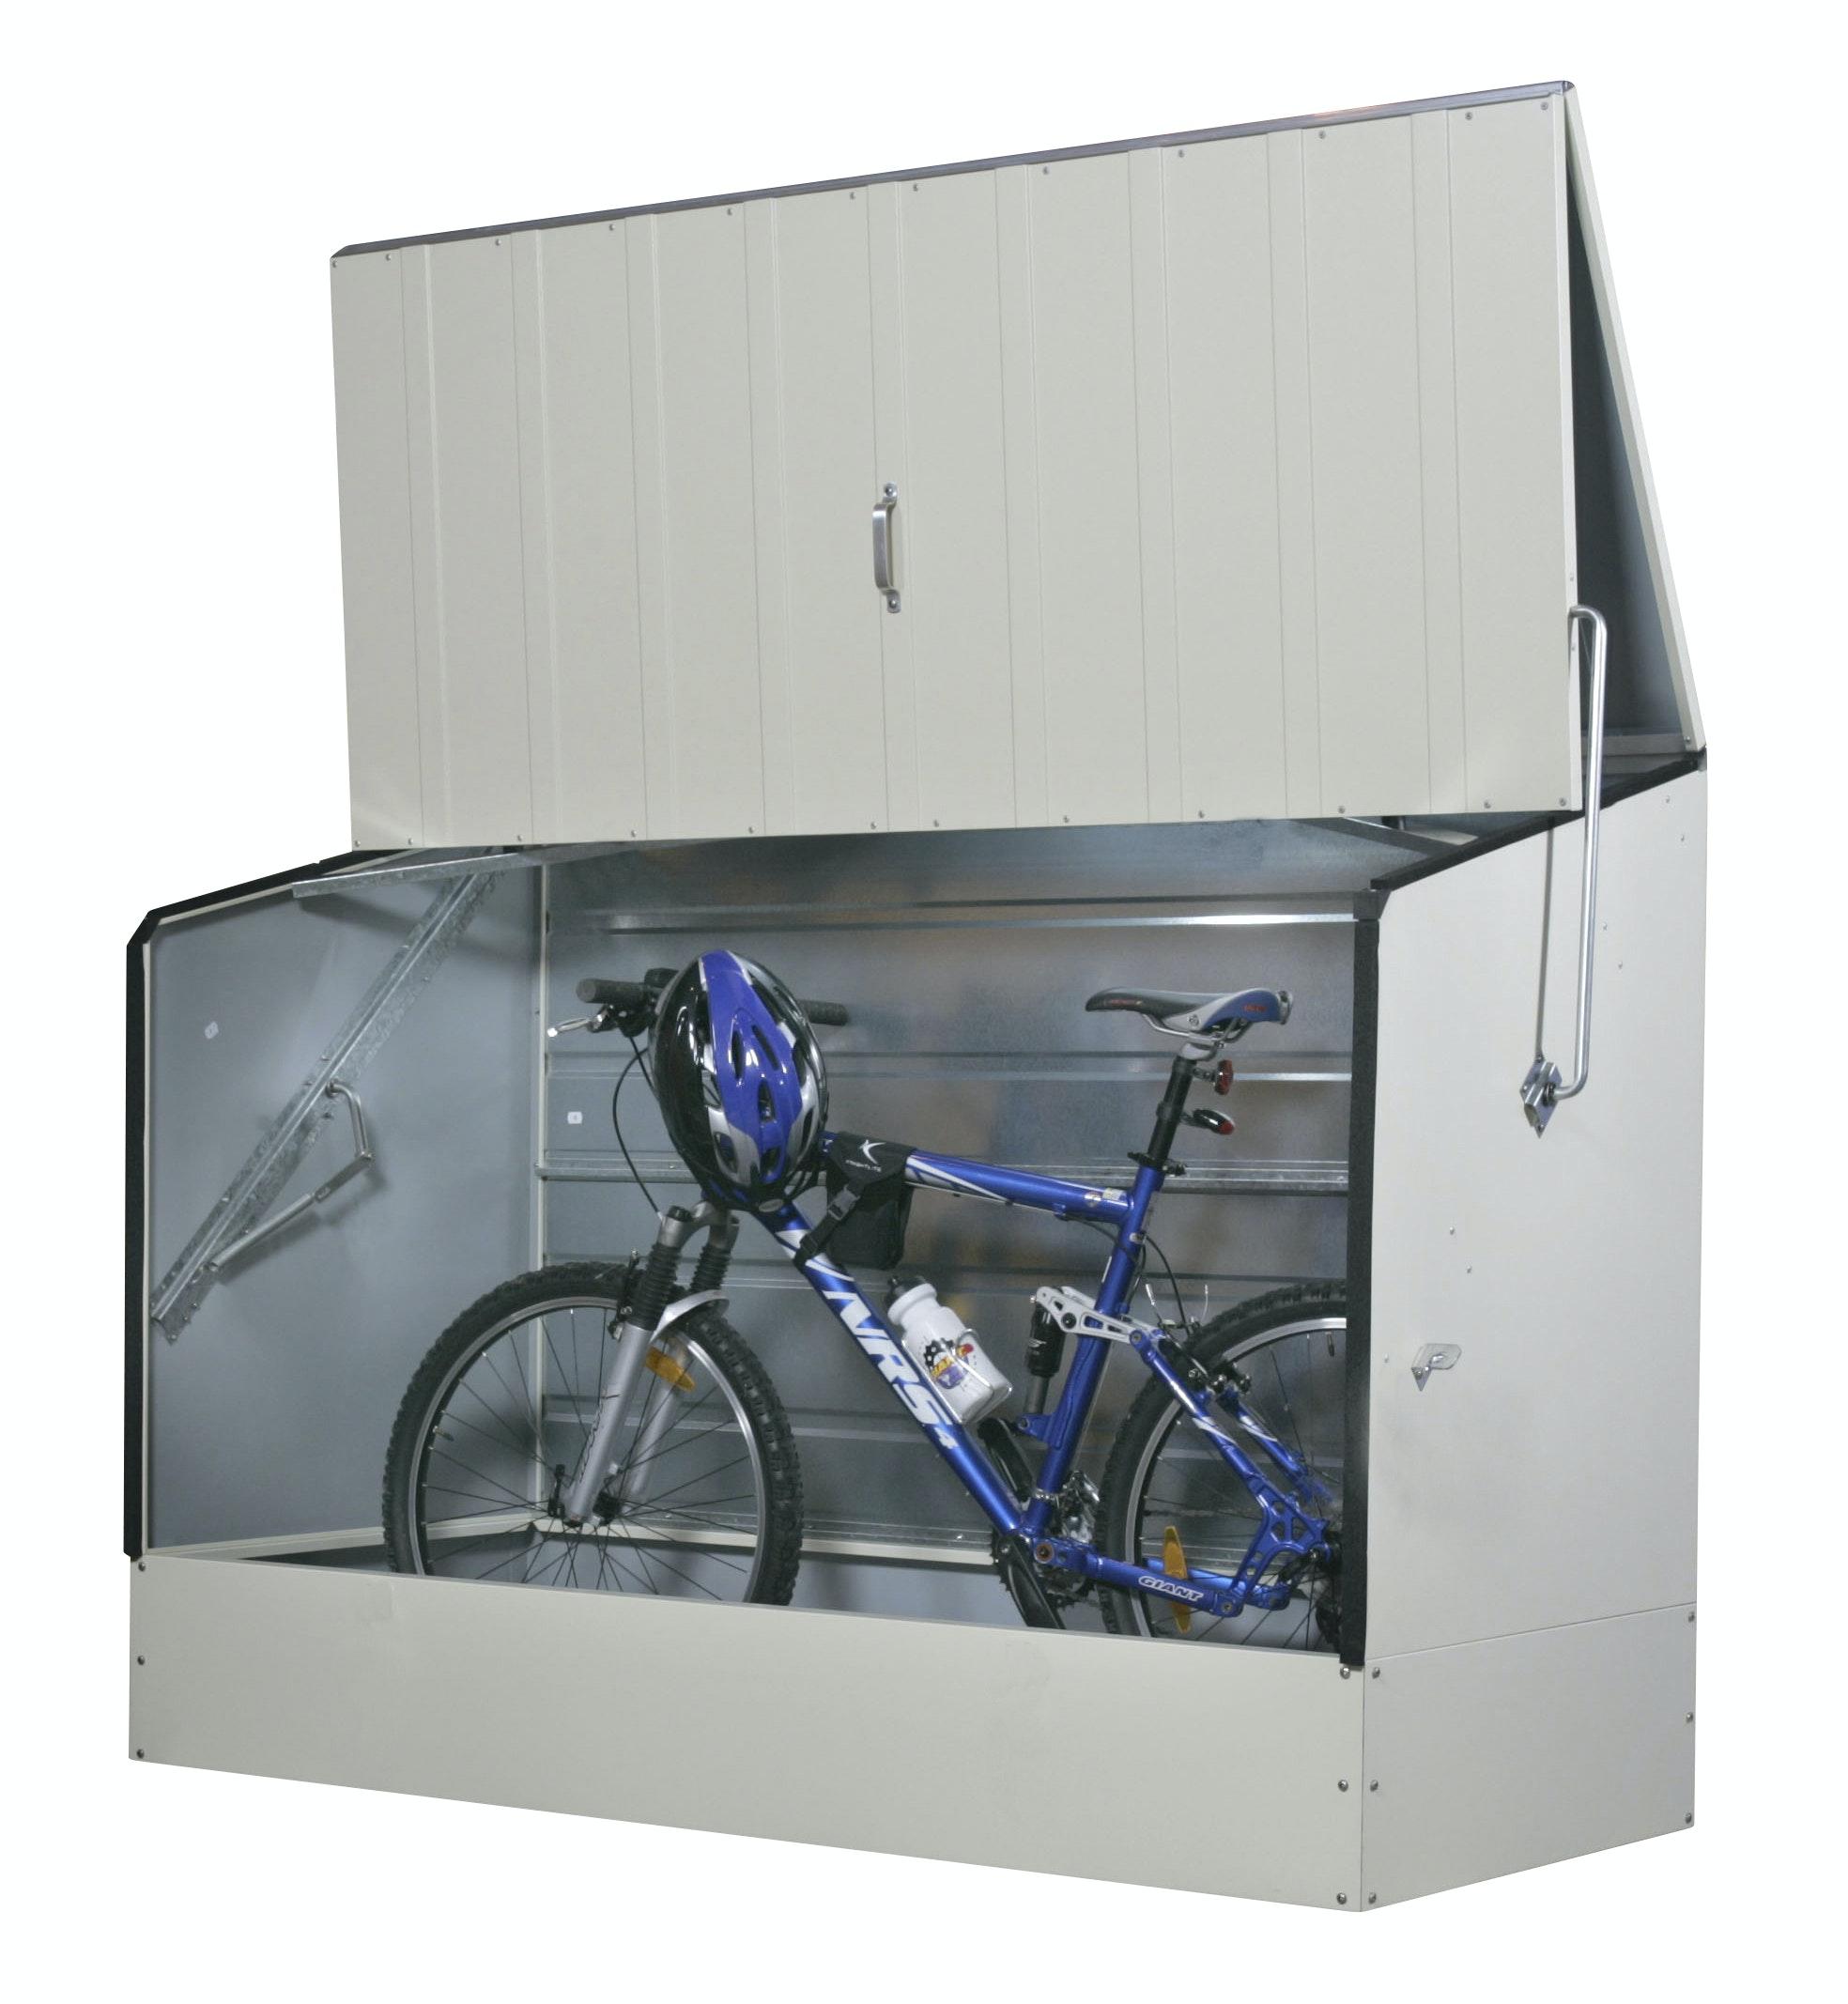 Förvaringsbox Gop Bicyclestore Cremevit